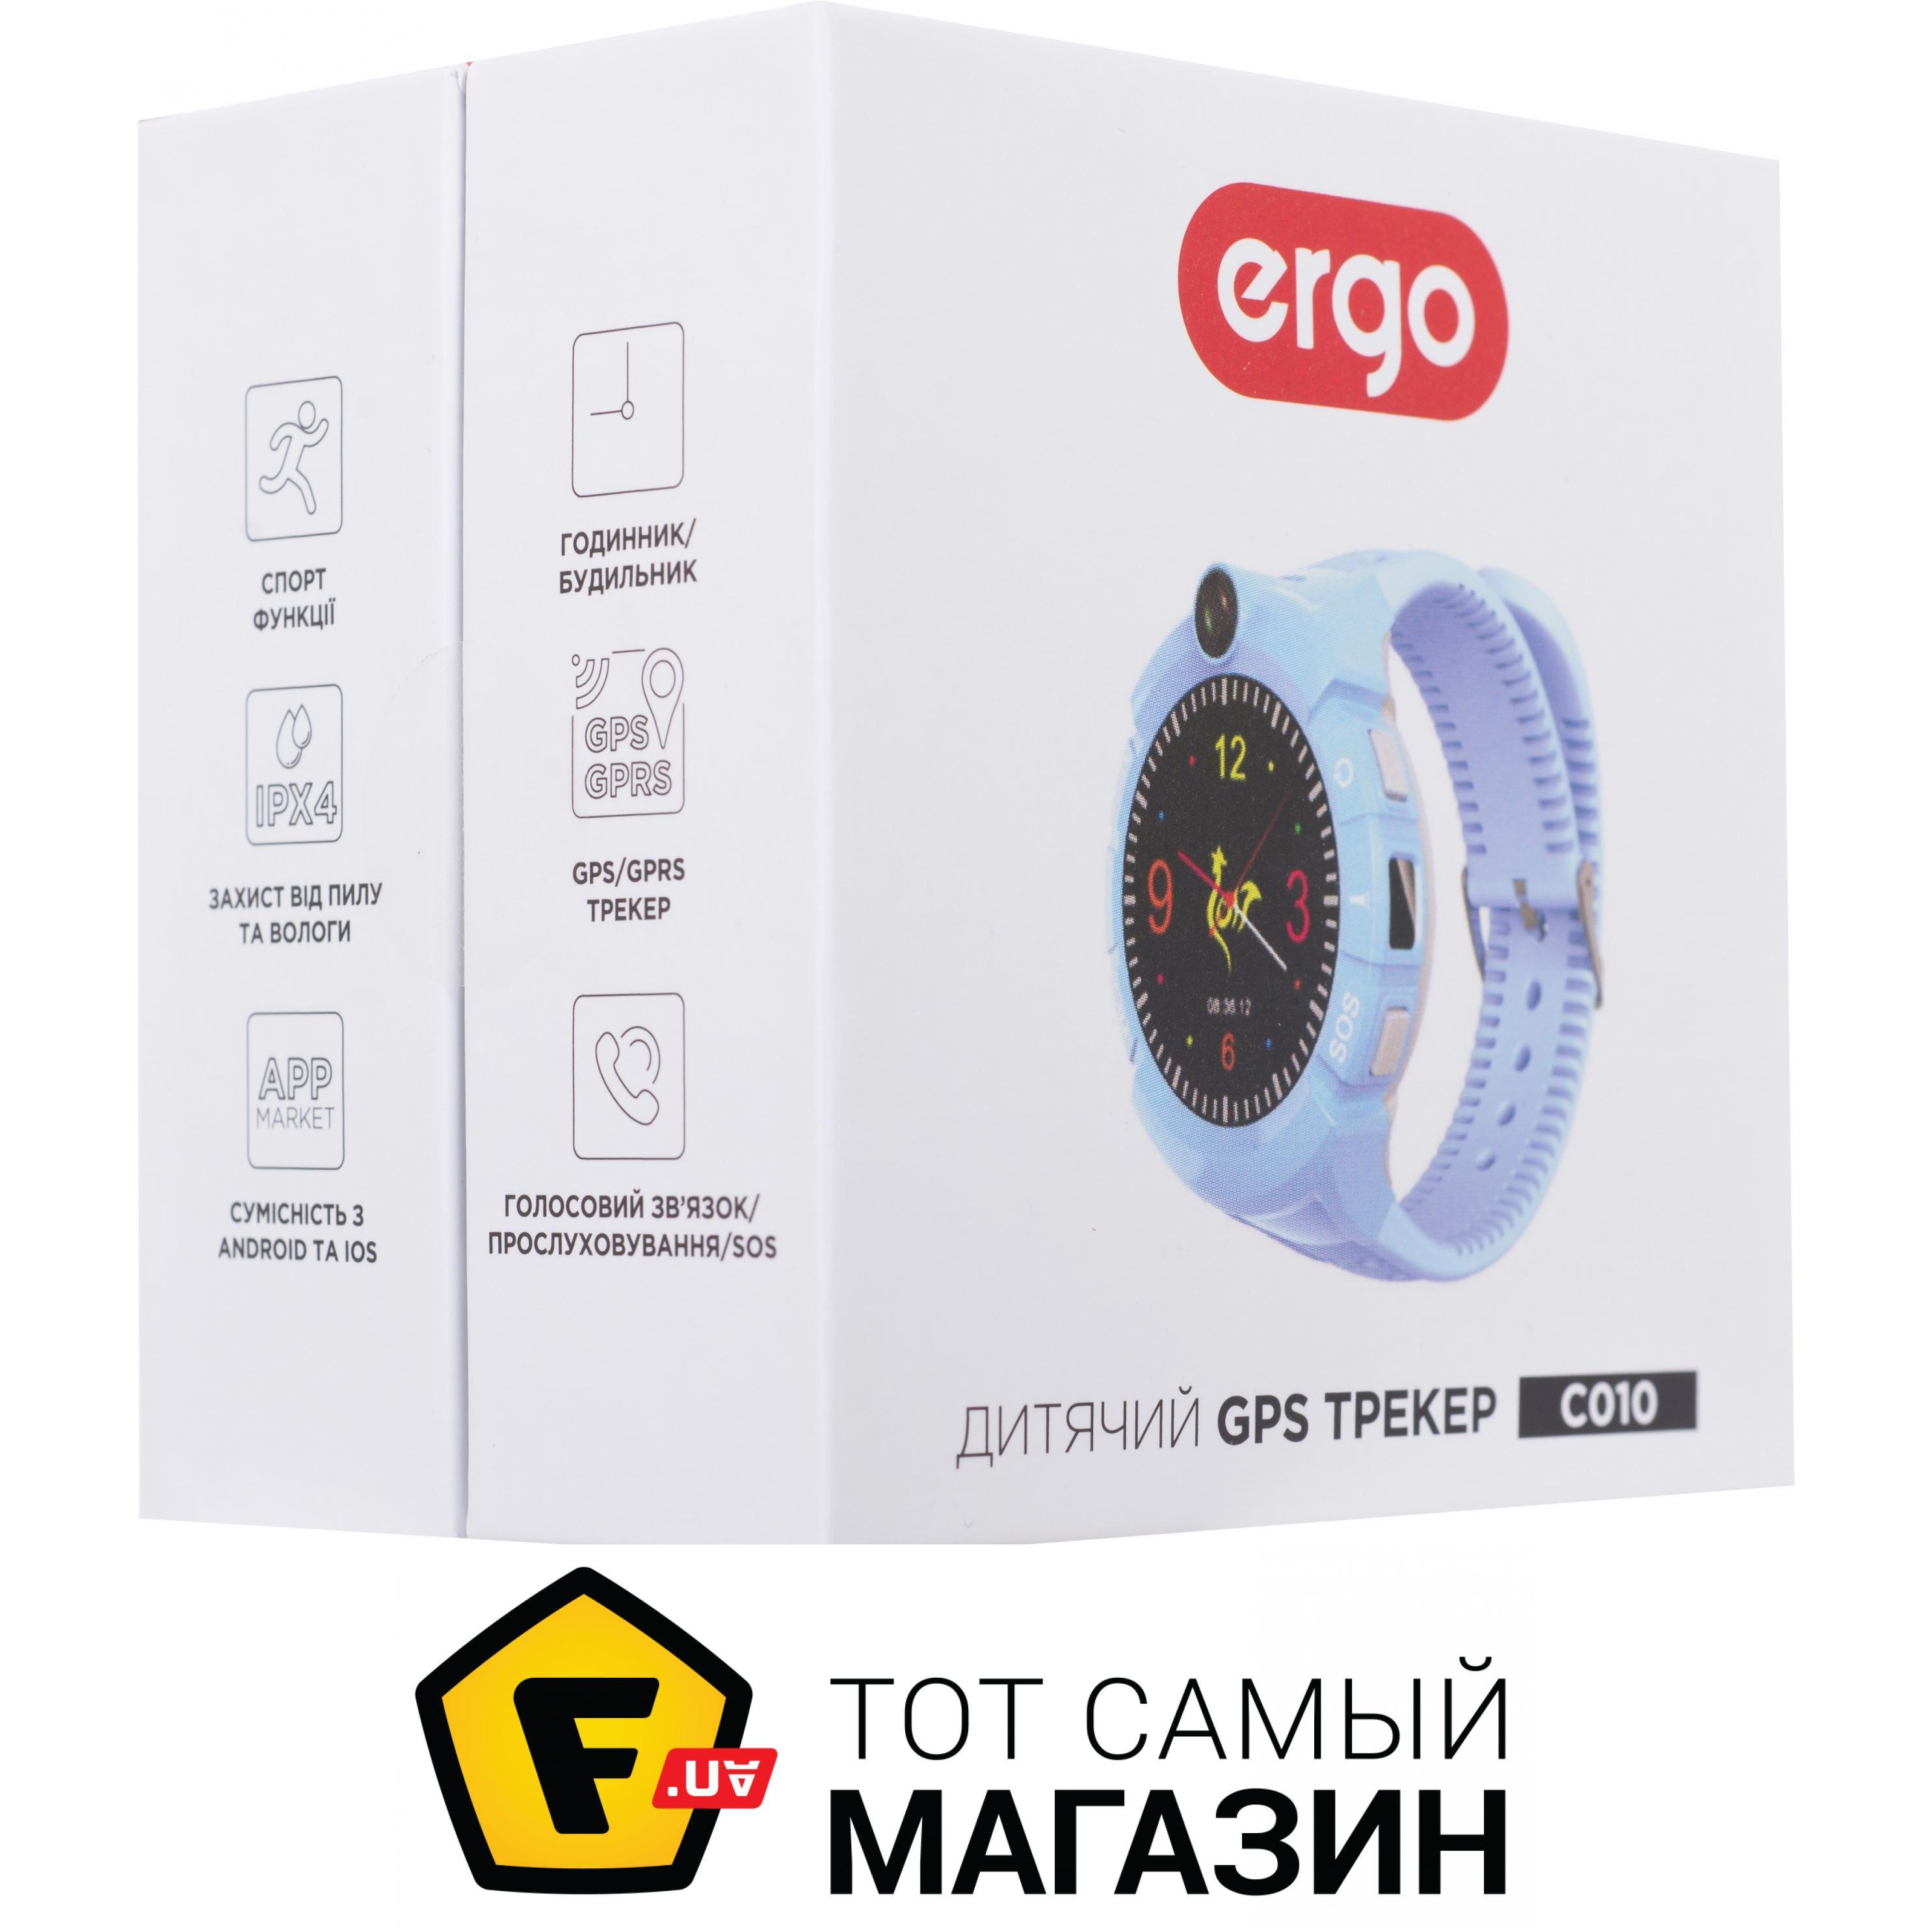 ᐈ ERGO GPS Tracker Color C010 ~ Надо Купить  ЦЕНА Снижена ERGO GPS ... 094e89377ba64